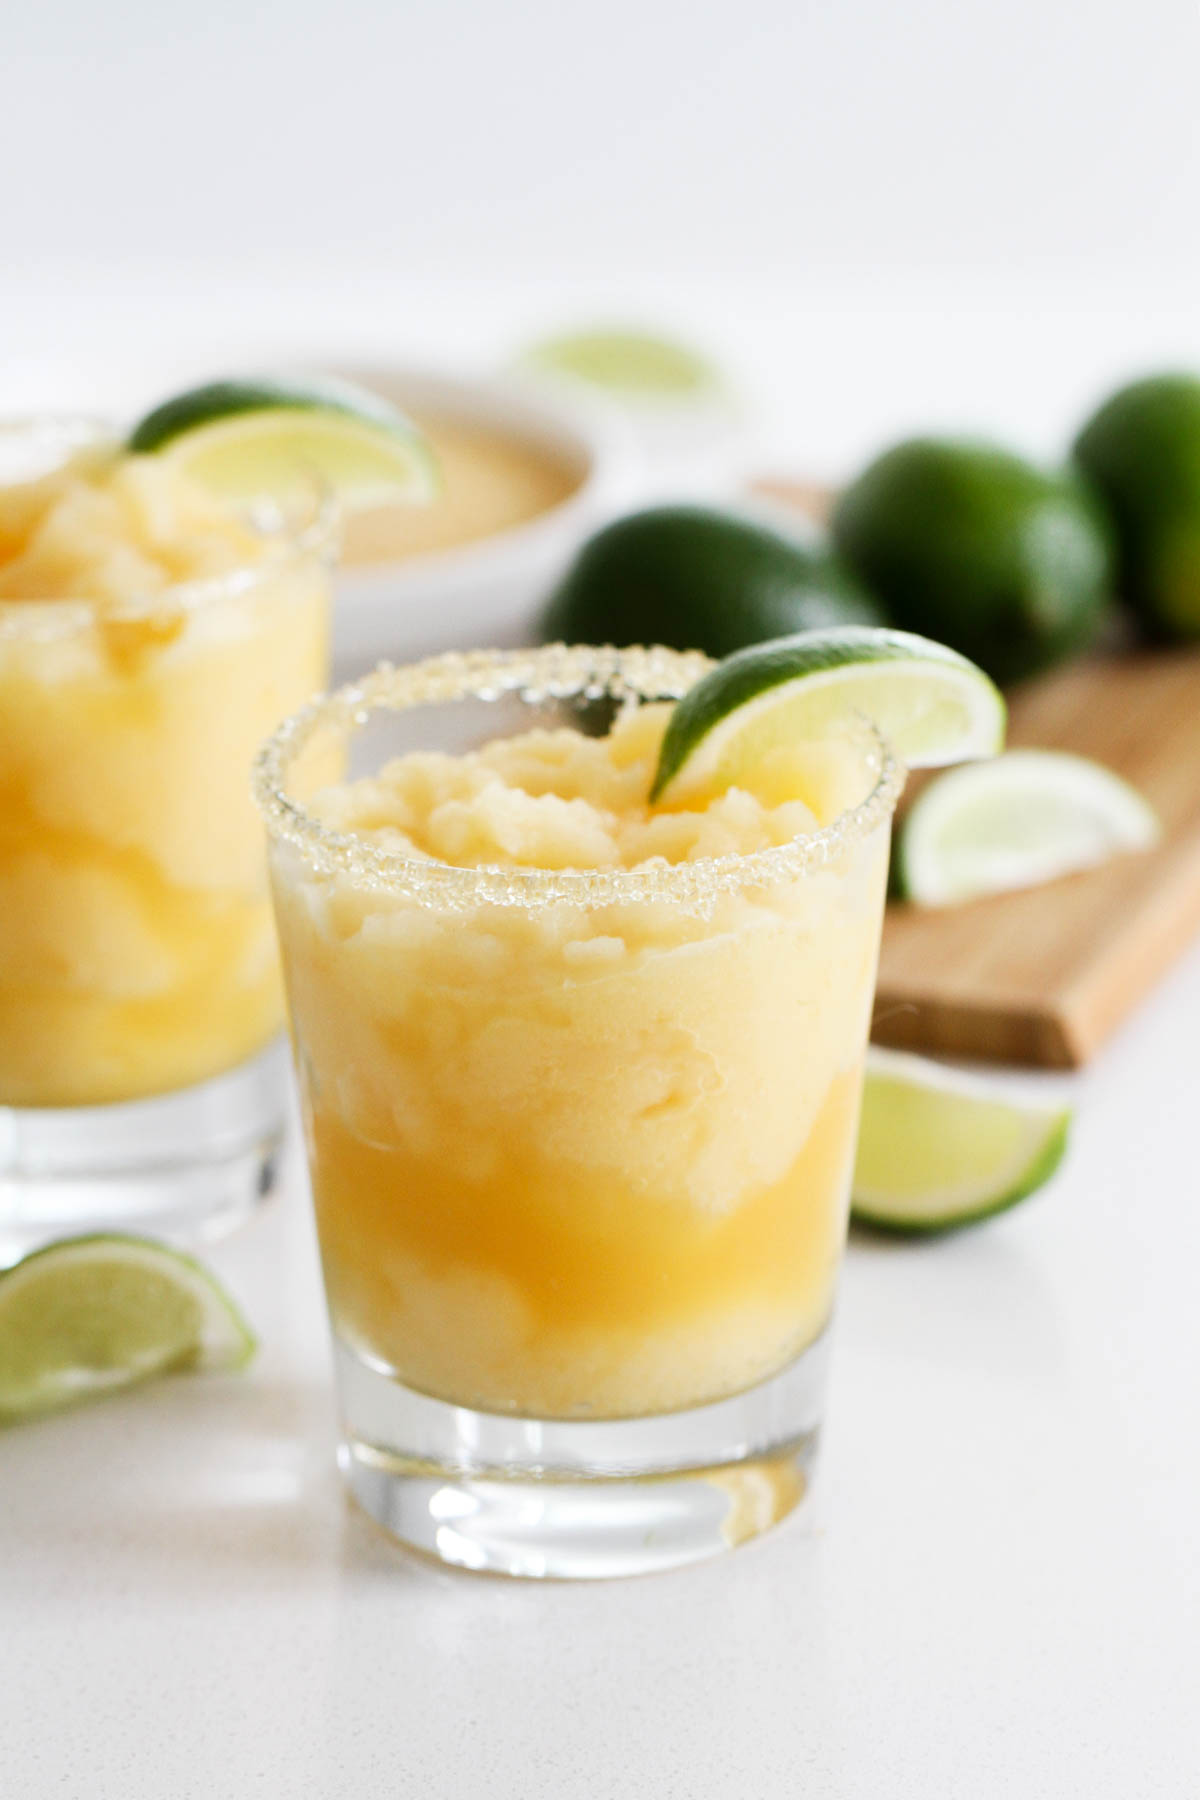 Virgin Frozen Margaritas with lime slices